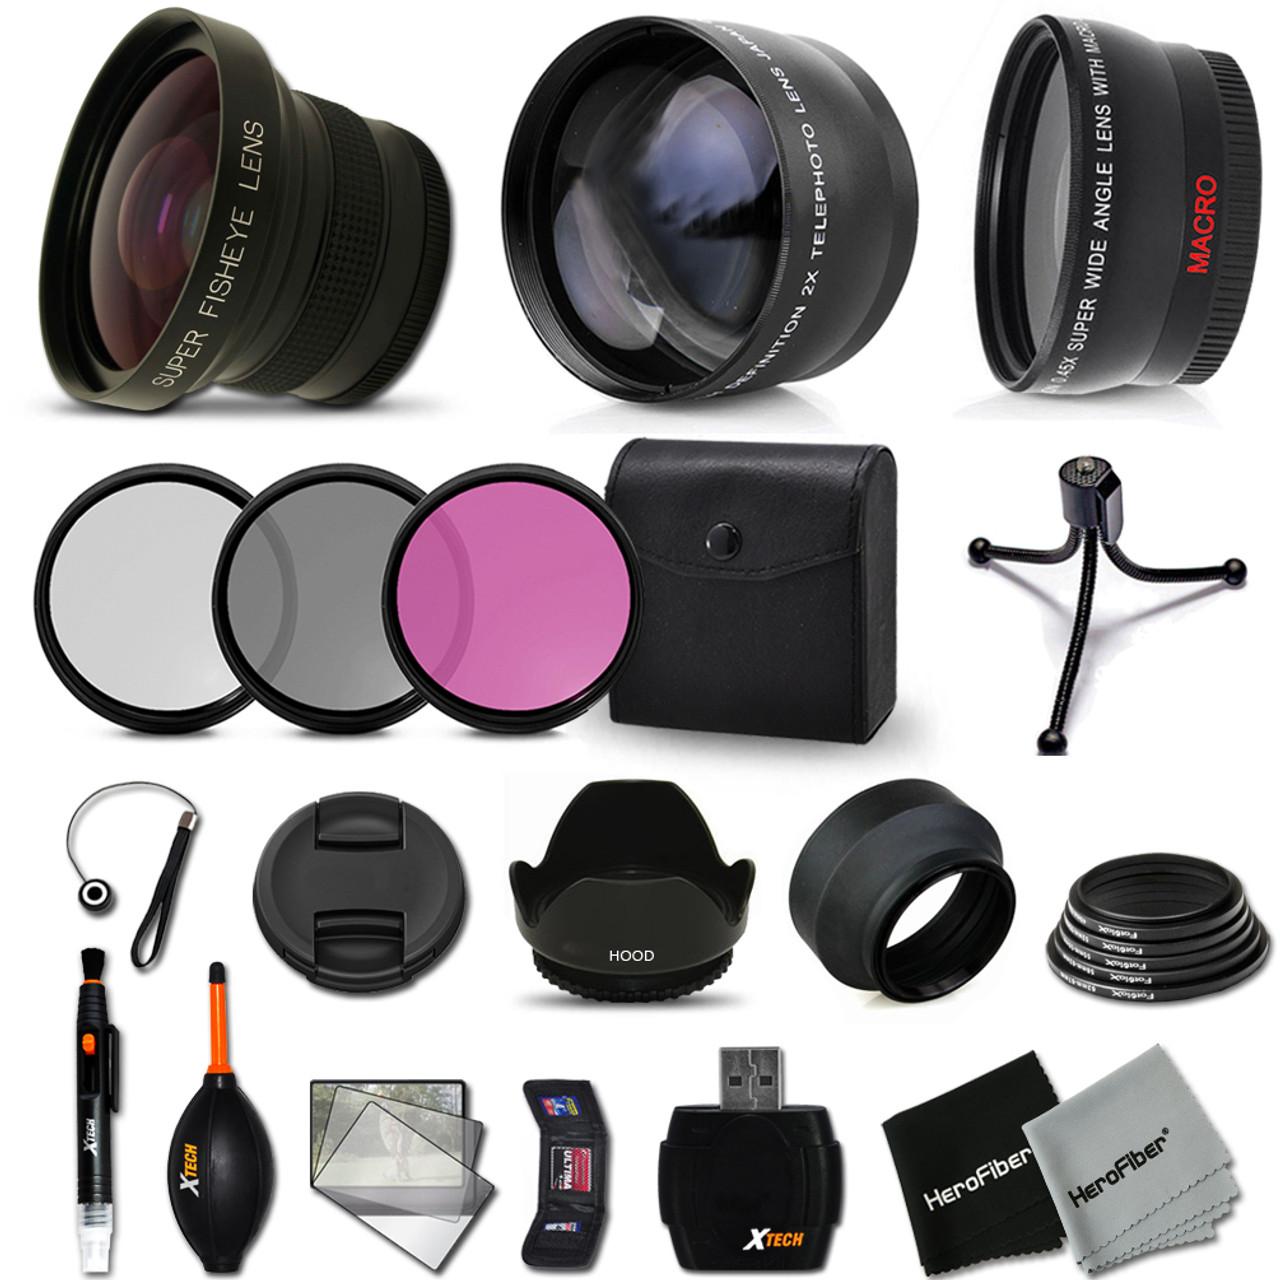 3 Piece Filter Kit for Nikon D5300 with Nikon 50mm 1.4 Lens Fibercloth Deluxe Lens Bundle Wide Angle DavisMAX 58mm Macro Close Up Kit 2X Telephoto Lenses